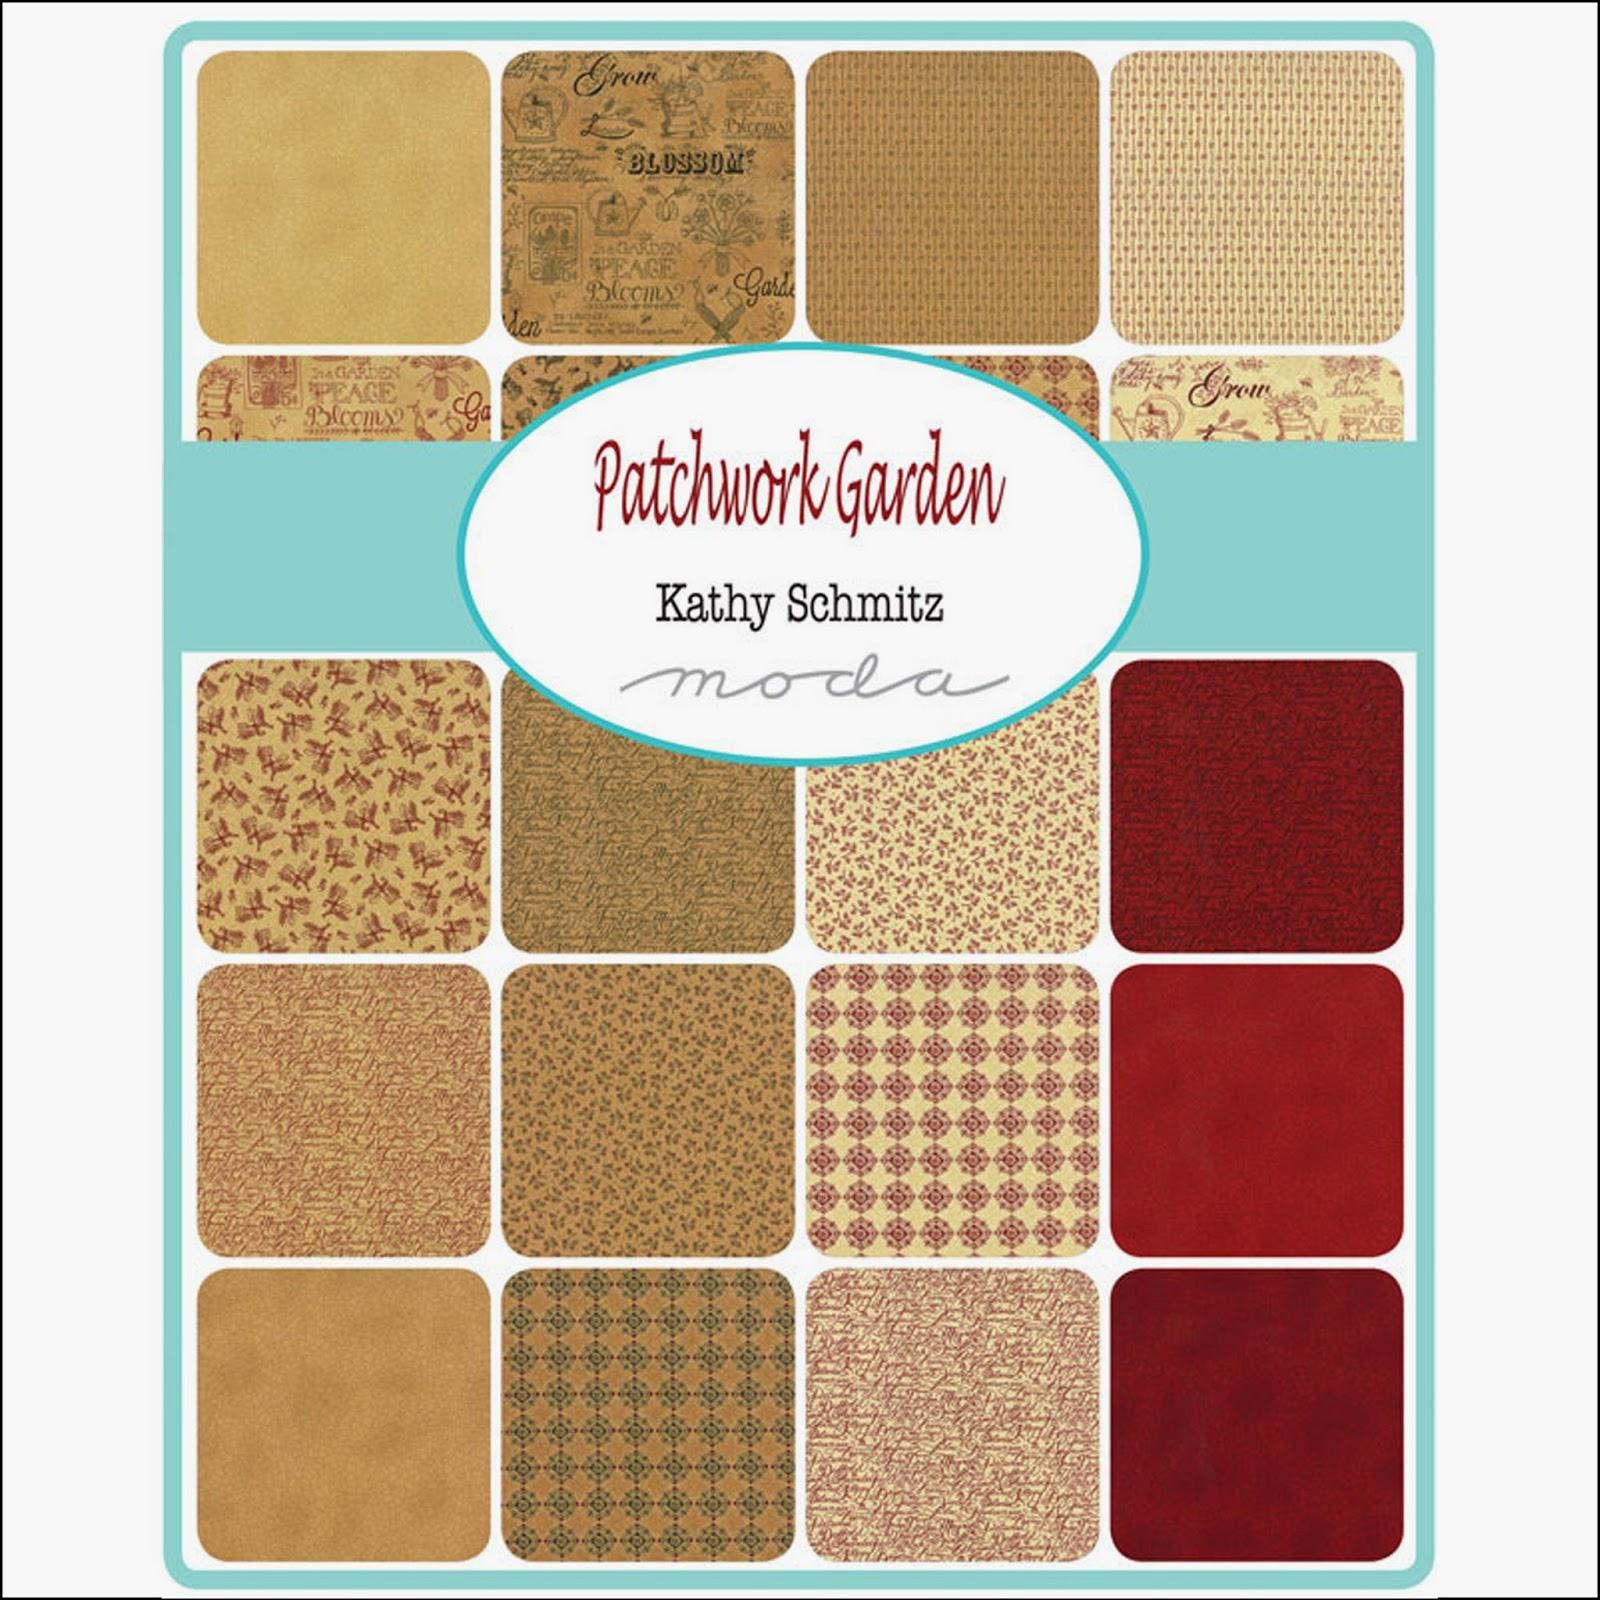 Moda PATCHWORK GARDEN Quilt Fabric by Kathy Schmitz for Moda Fabrics